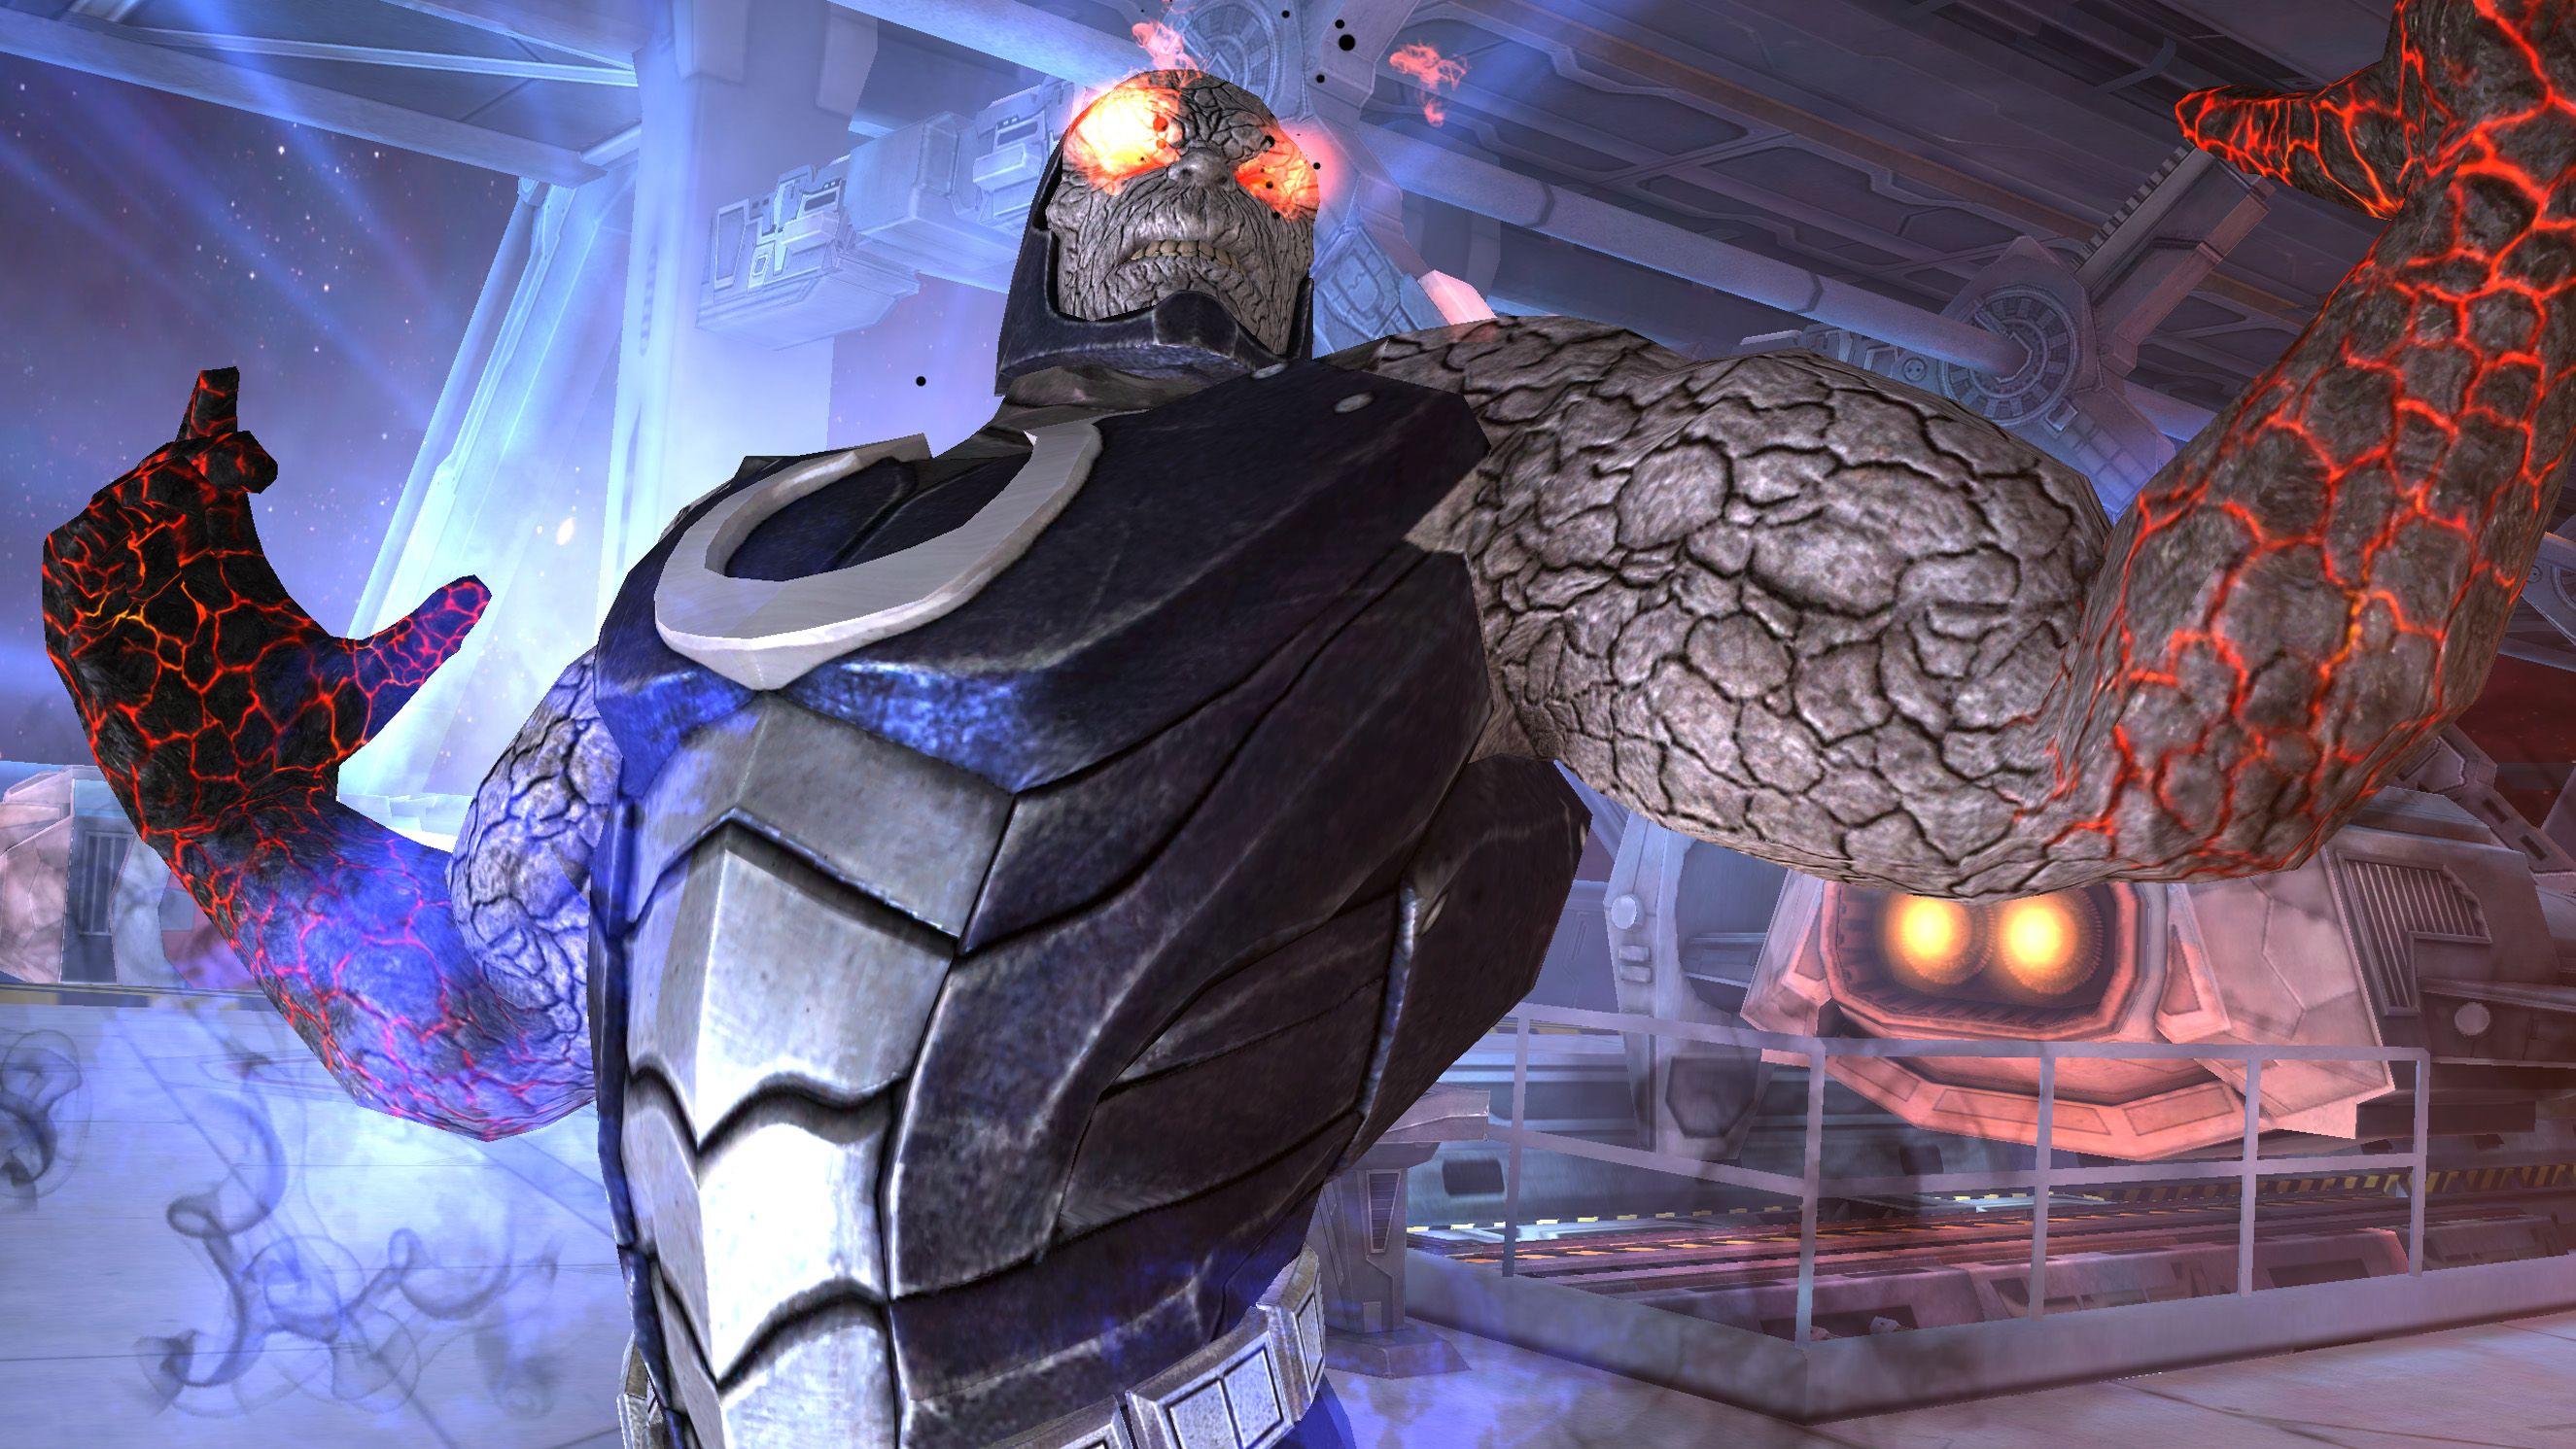 Darkseid Debuts On Injustice Gods Among Us Mobile Http Www Reelfilmnews Com 2014 03 06 Injustice Debuts Darkseid Character E Darkseid Injustice Mobile Game